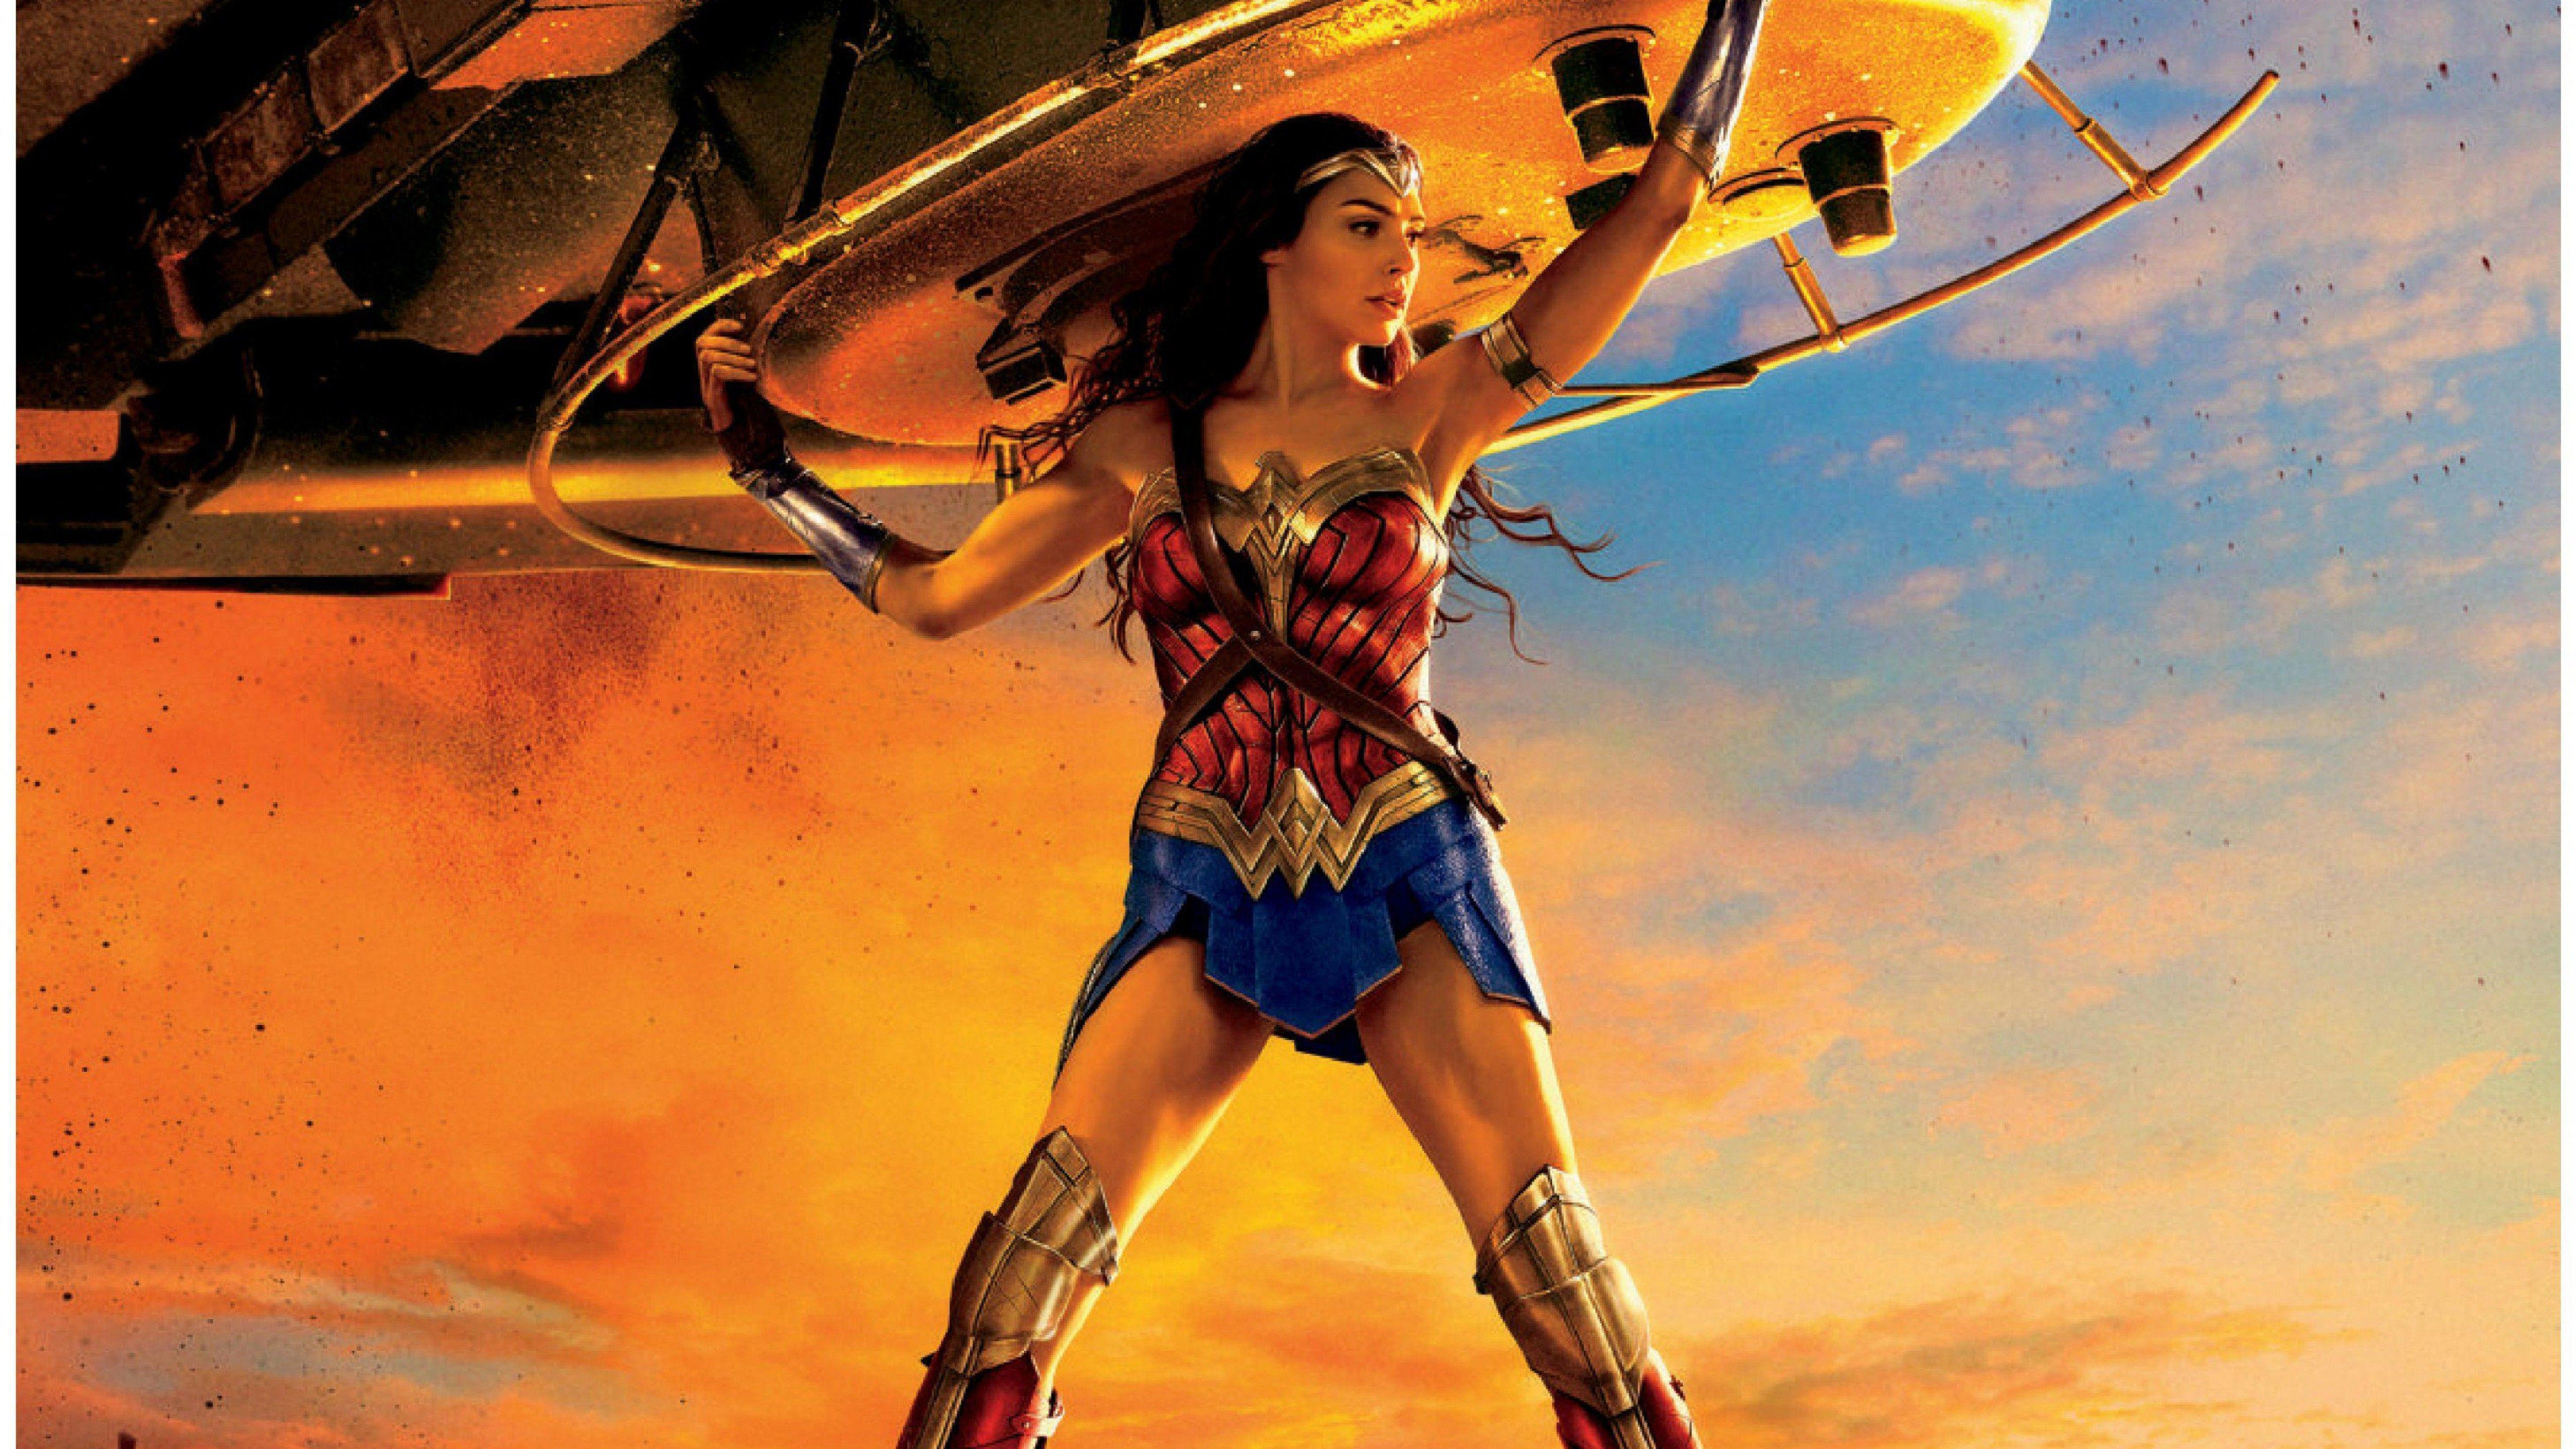 Wonder Woman Wallpapers Iphone Wallpaper Cave